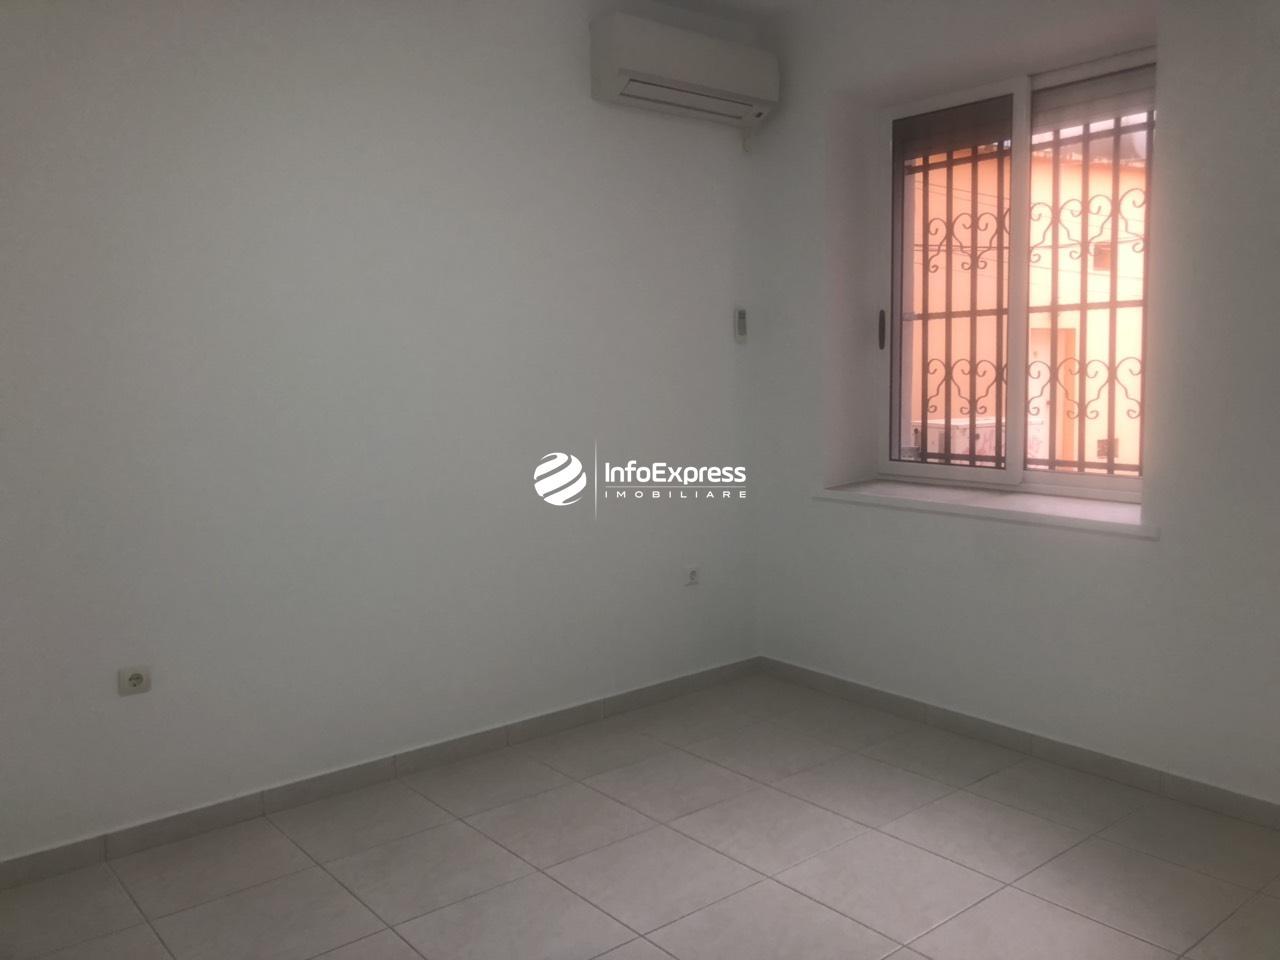 TRR-0618-1218 Jepet me qera apartament 2+1 ne Myslym  Shyri.